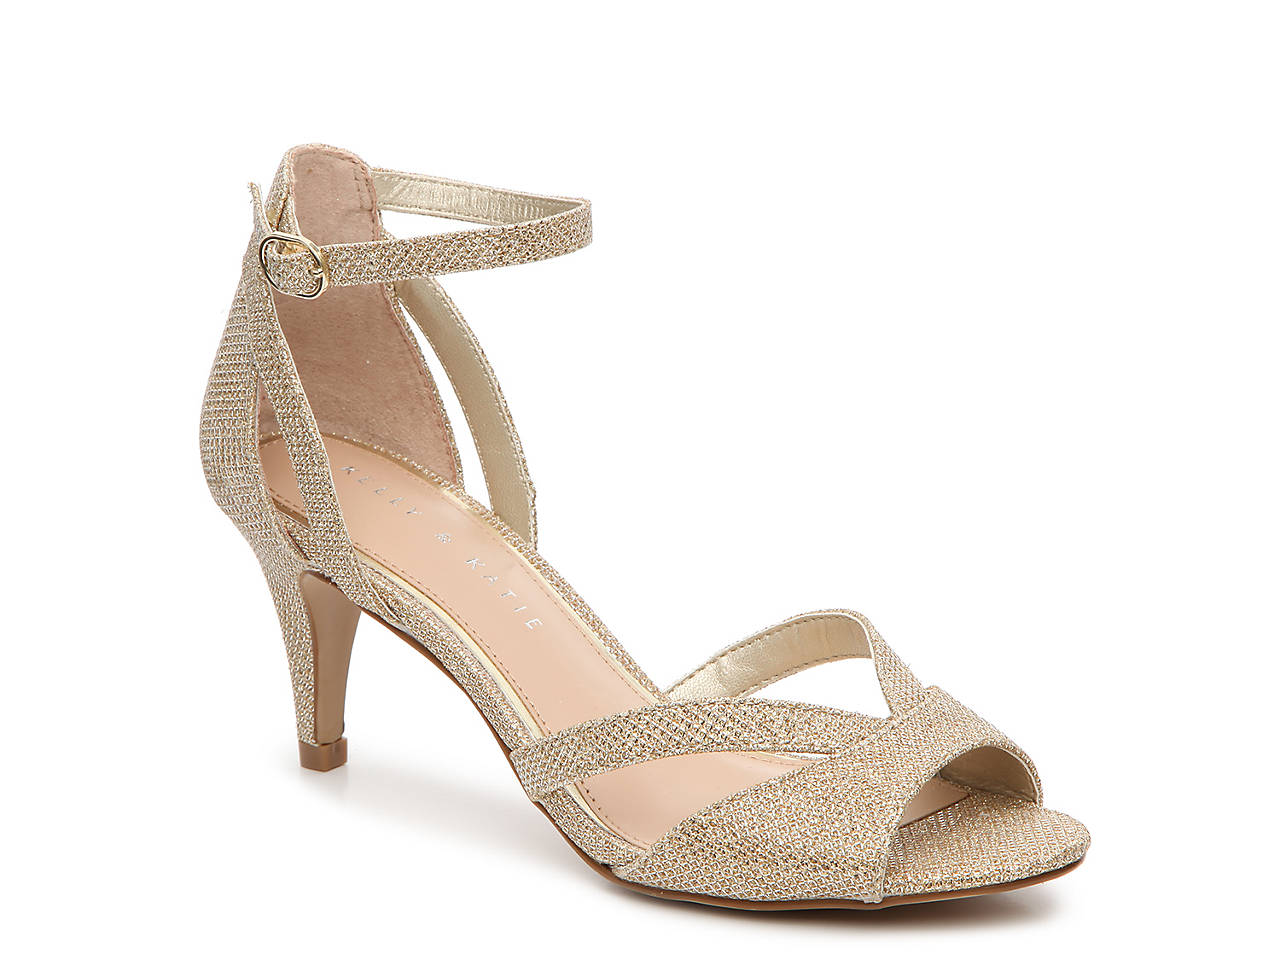 b0b4a31eda73 Kelly   Katie Valdena Sandal Women s Shoes